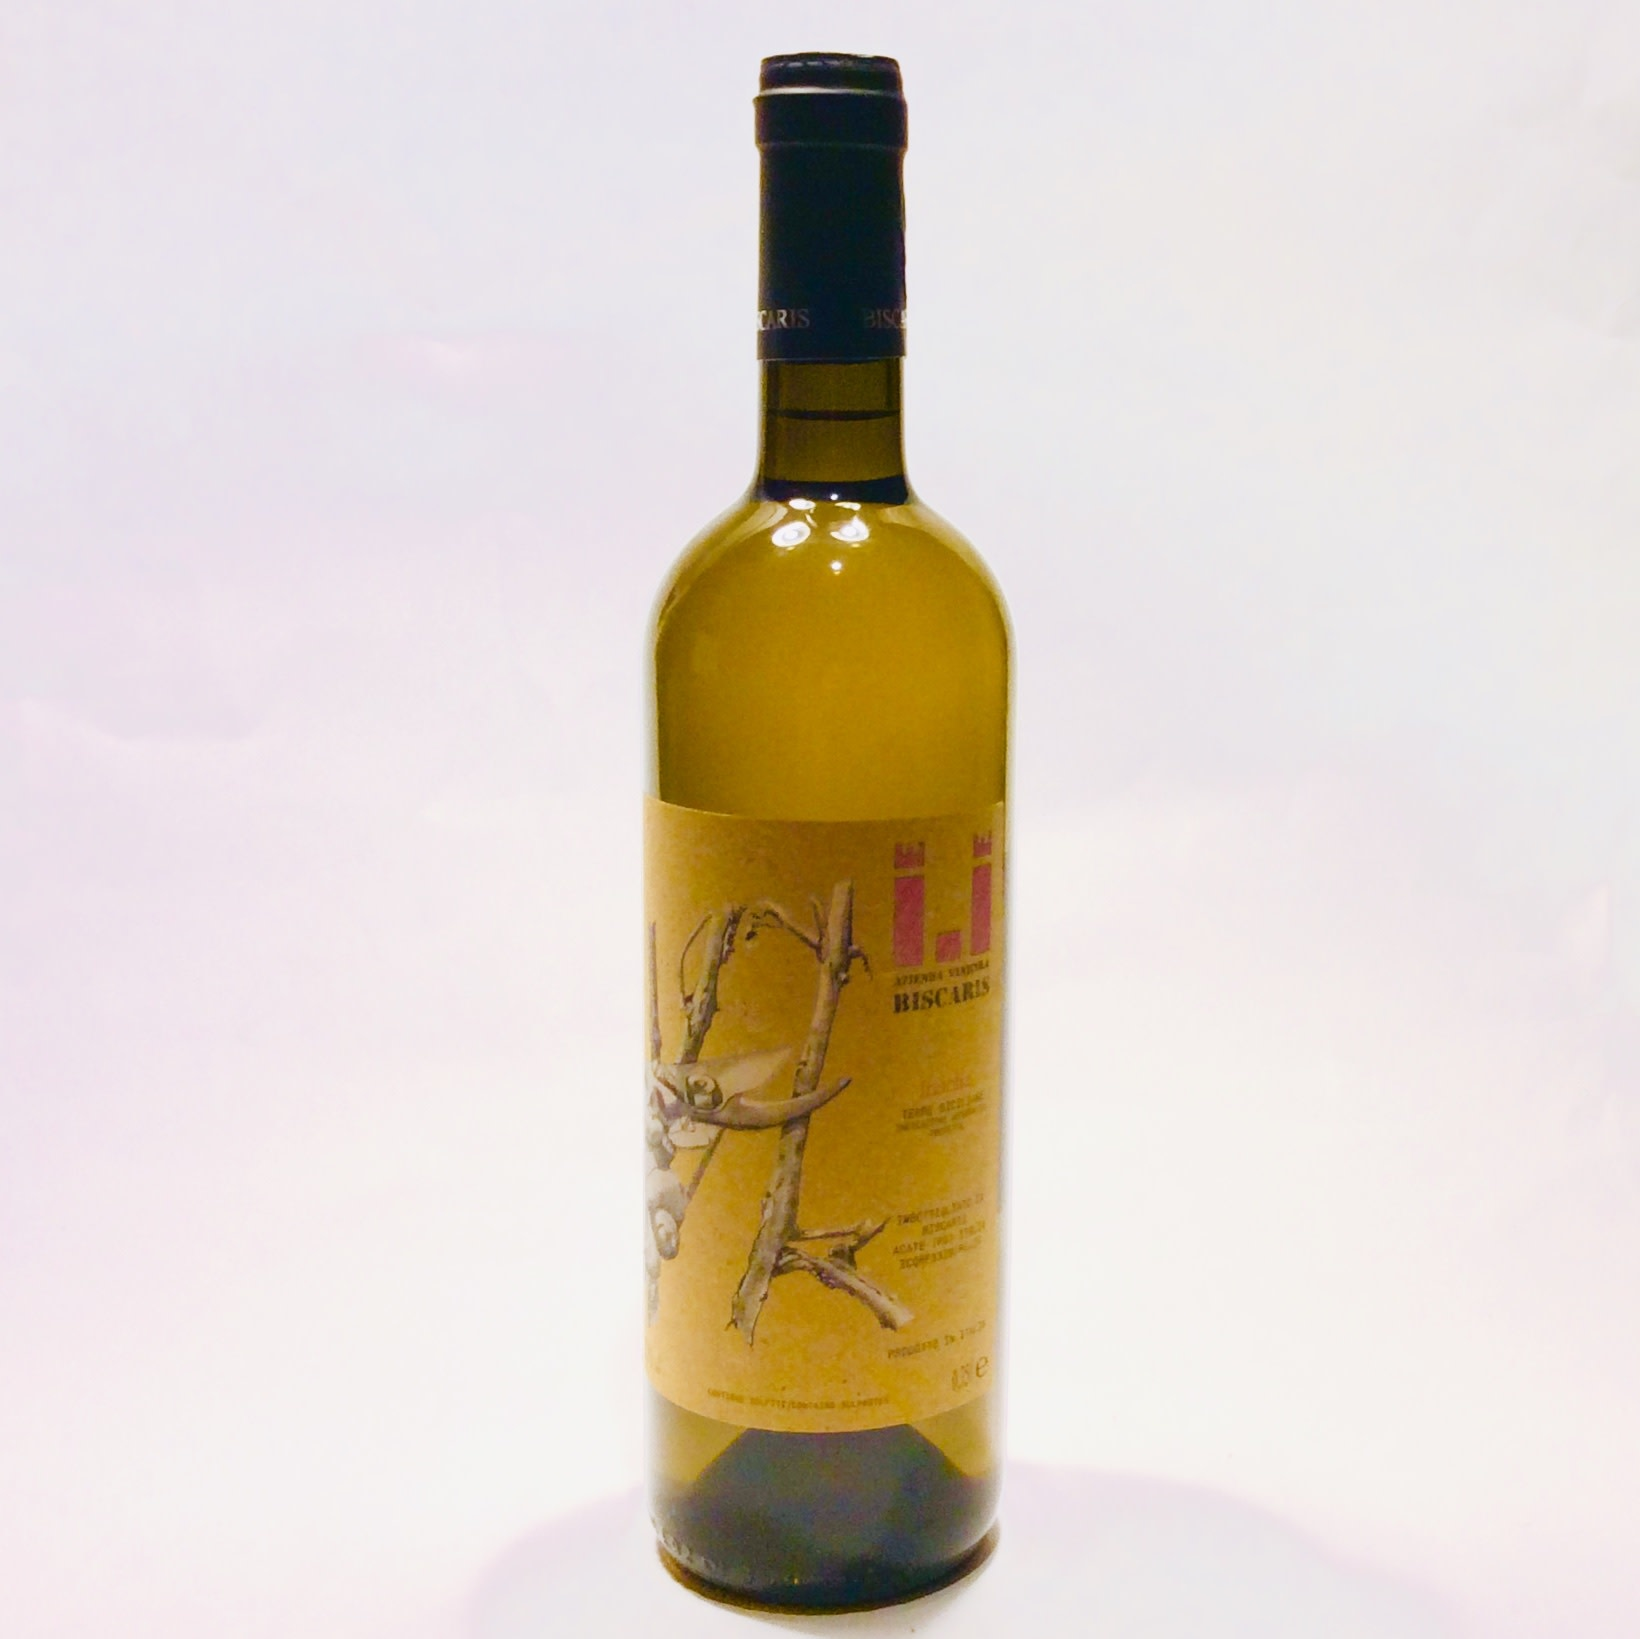 "Biscaris - Terre Siciliane ""Inzolia"" 2018 (750 ml)"